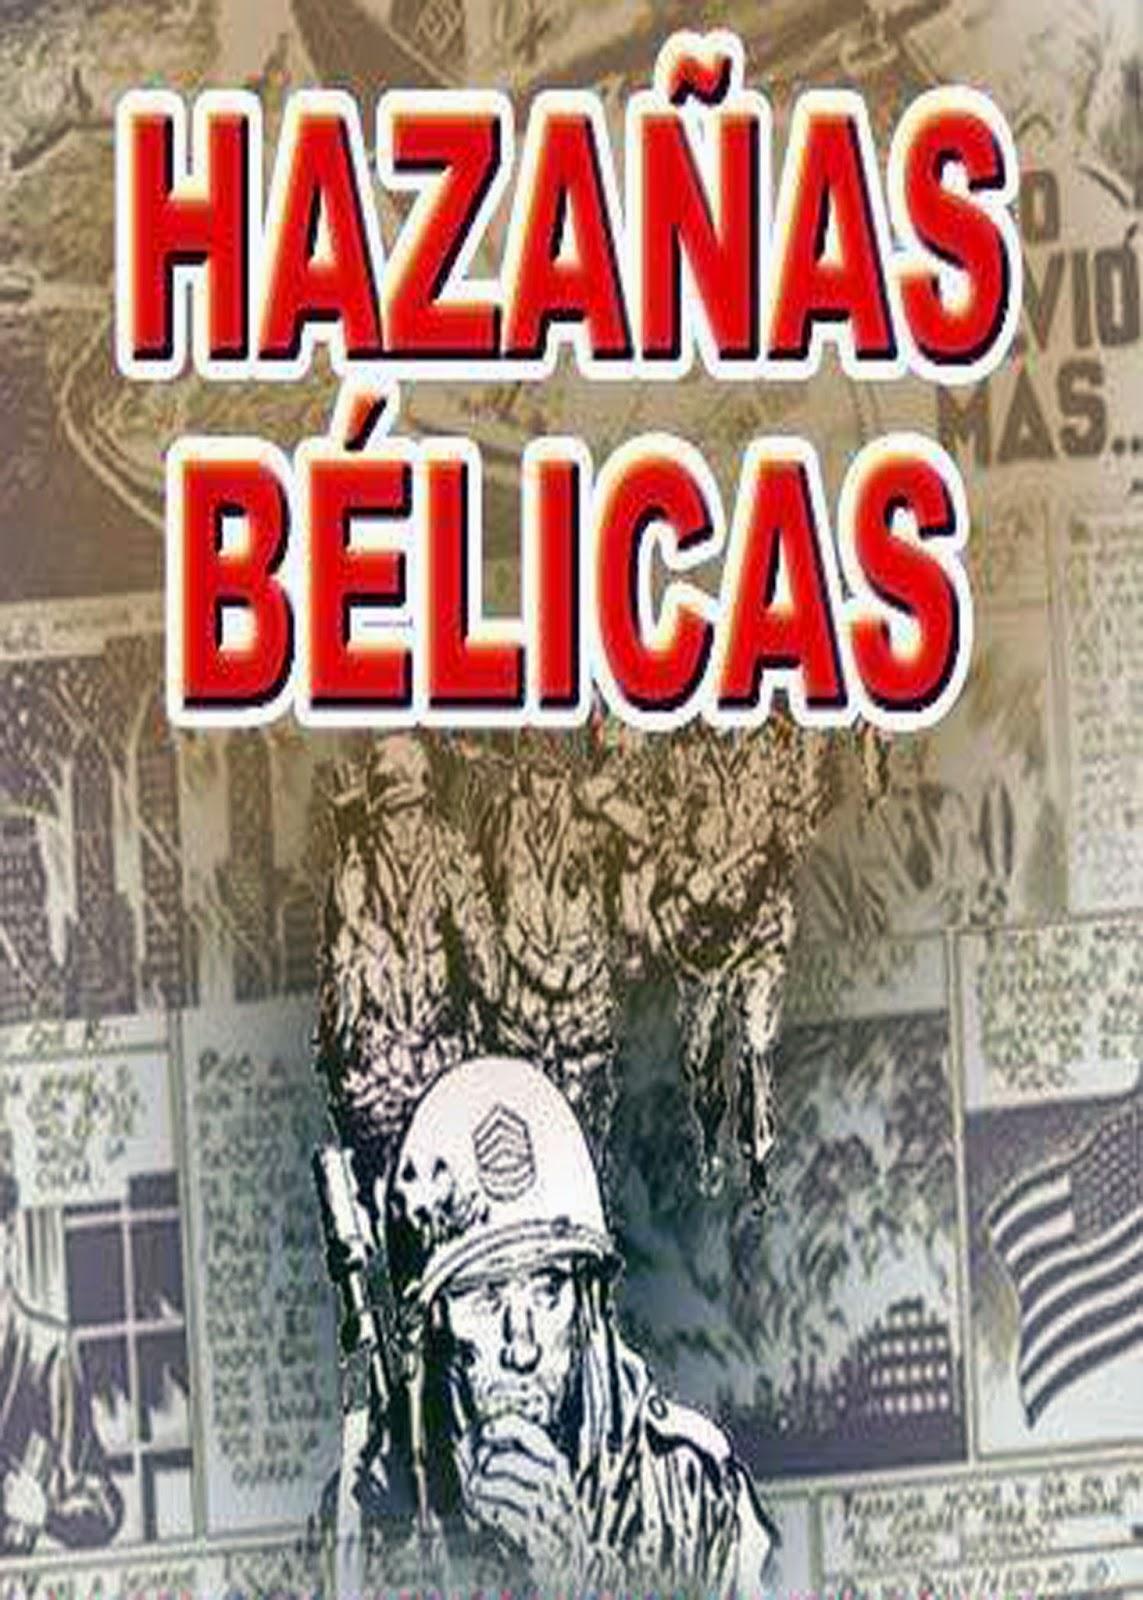 Hazañas bélicas (Combate) (1962-1967) Serie